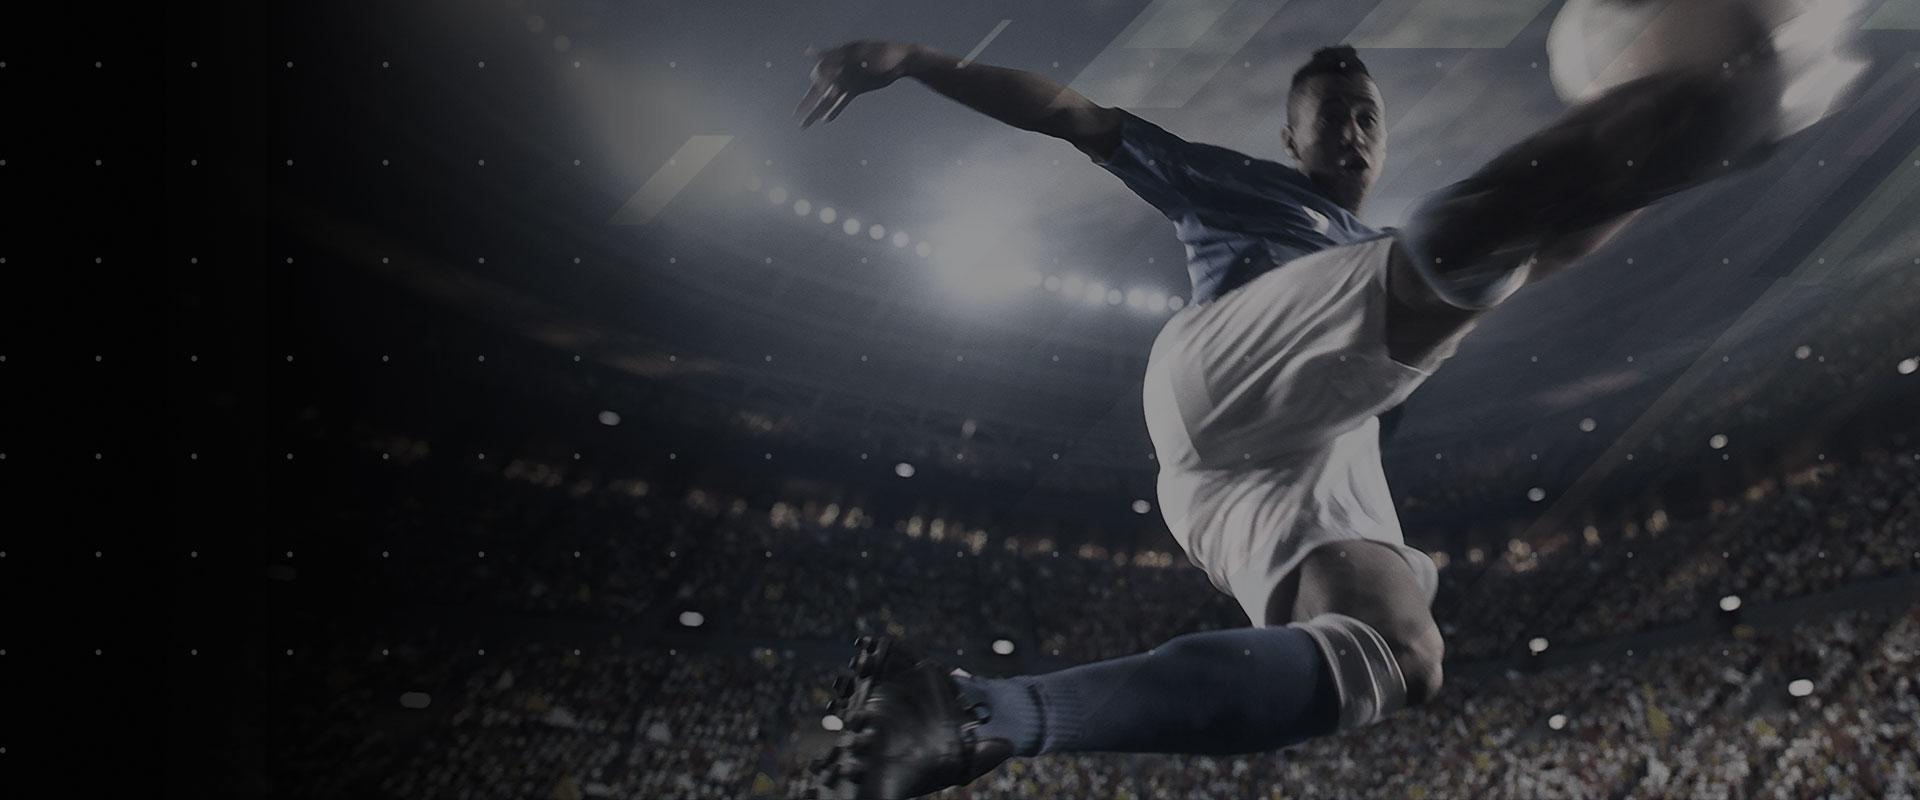 european football club report aprile iquii sport